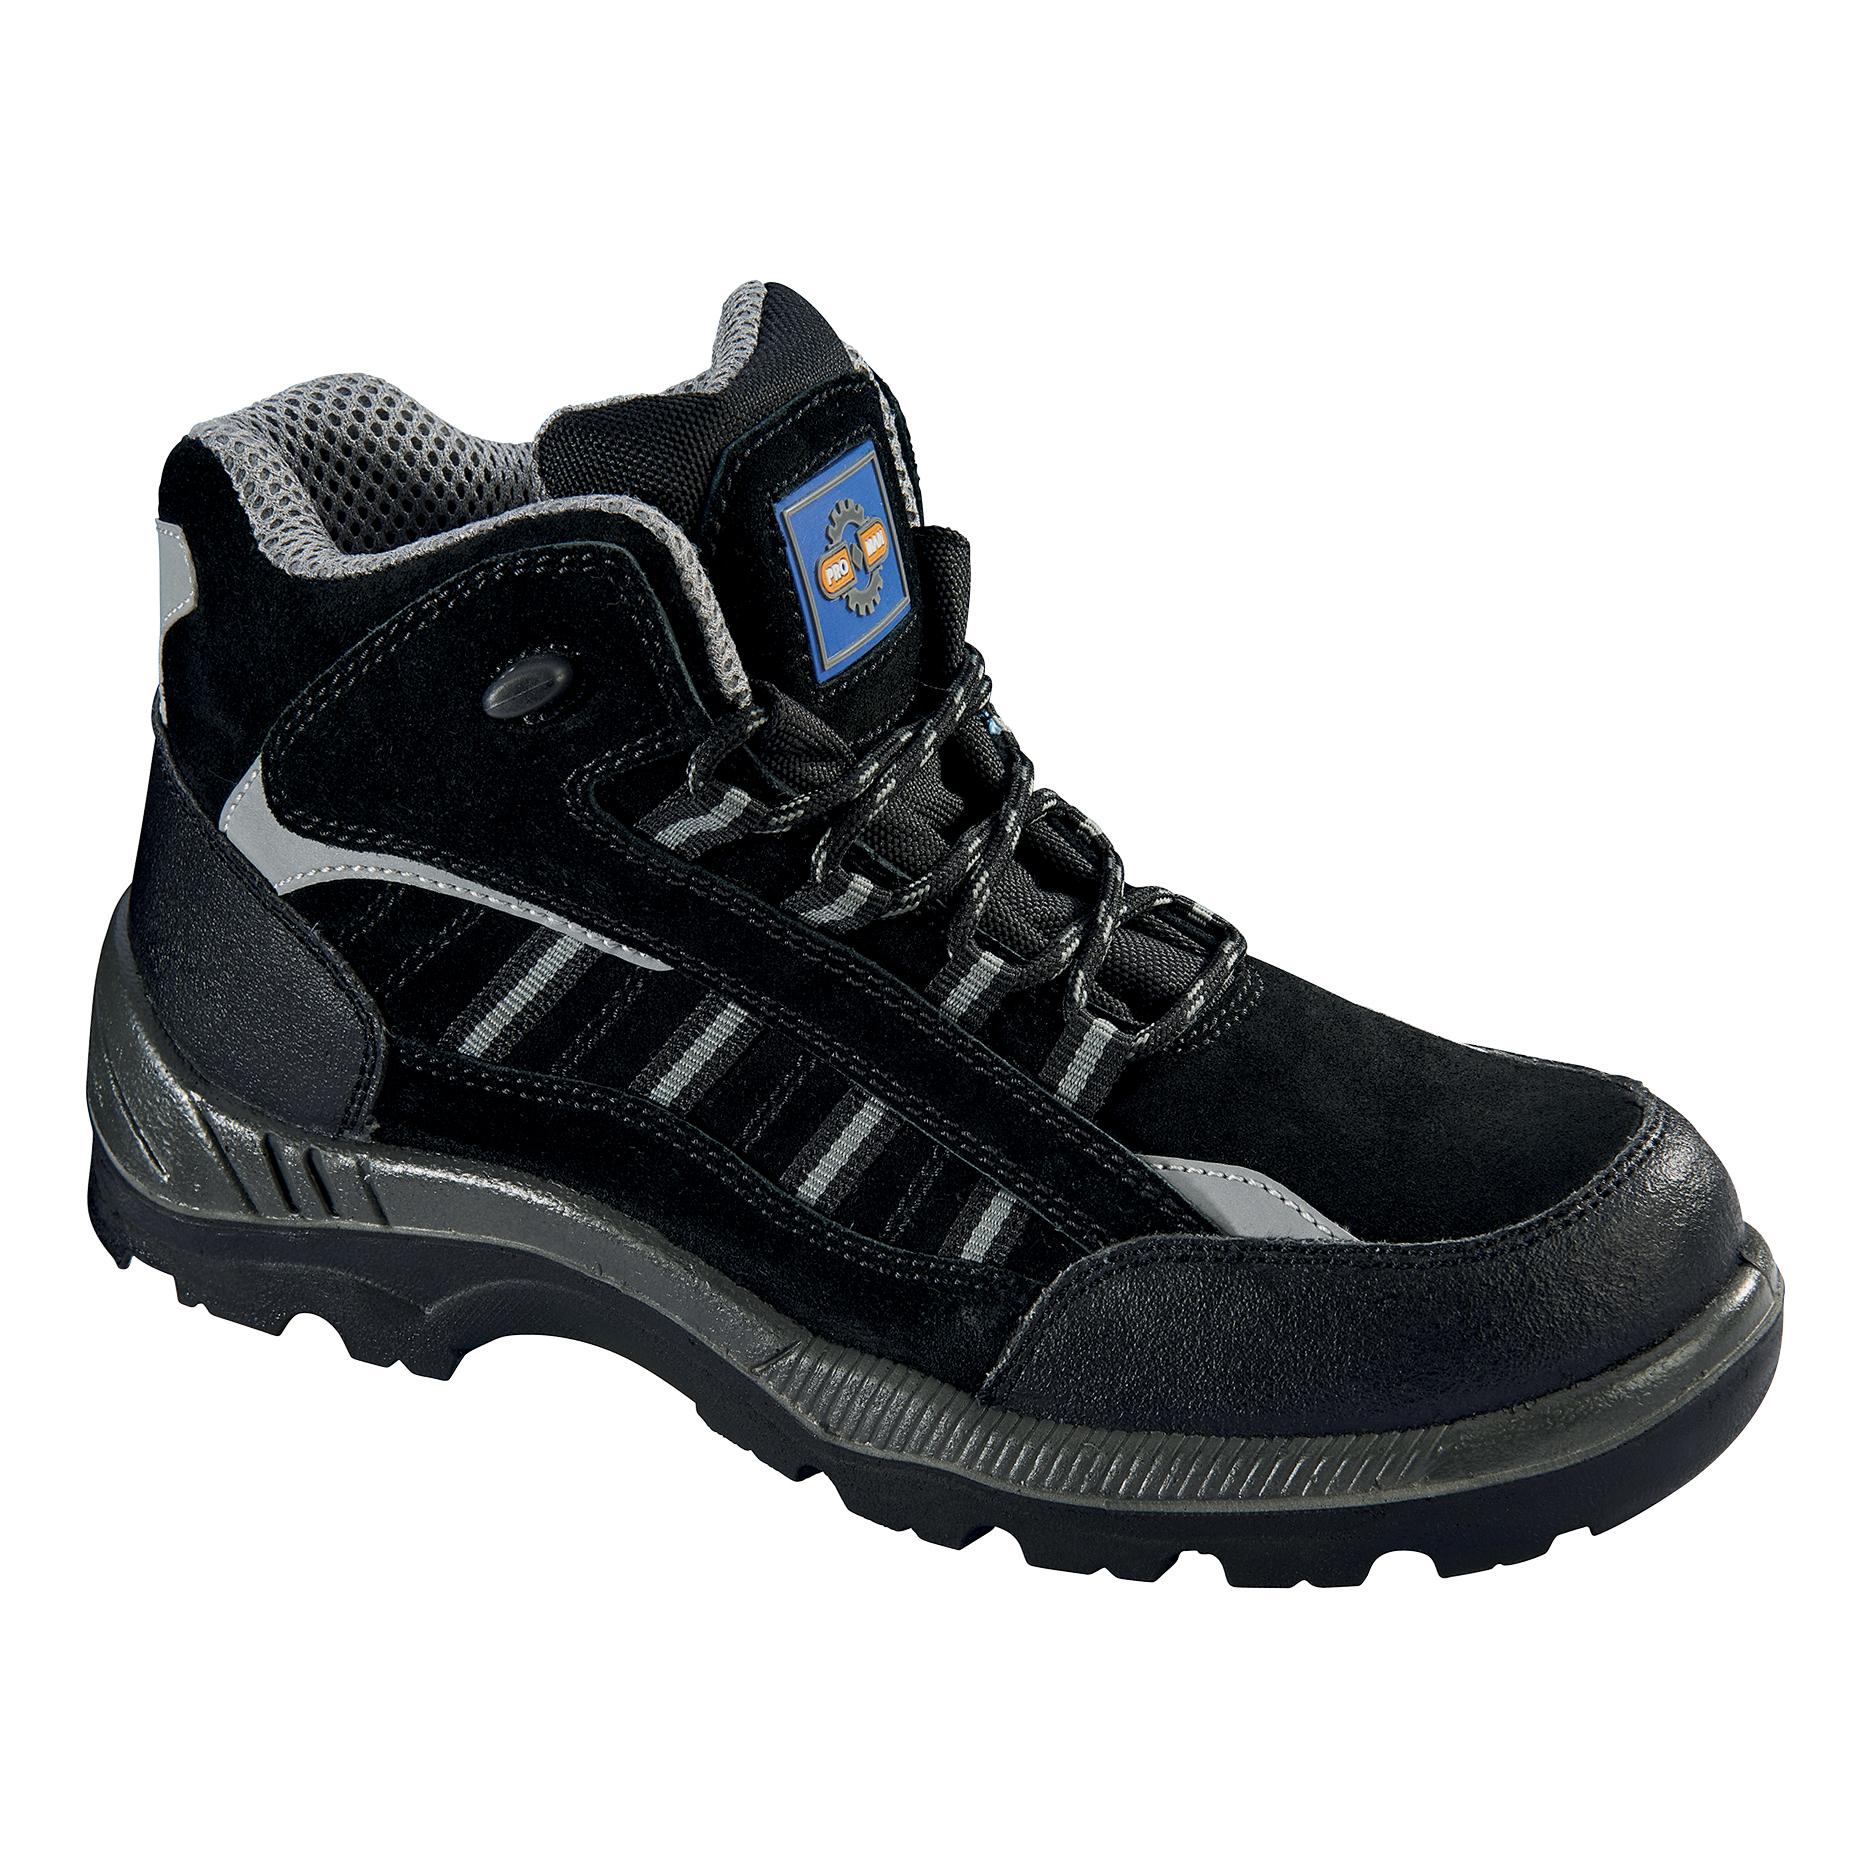 Rockfall ProMan Boot Suede Fibreglass Toecap Black Size 14 Ref PM4020 14